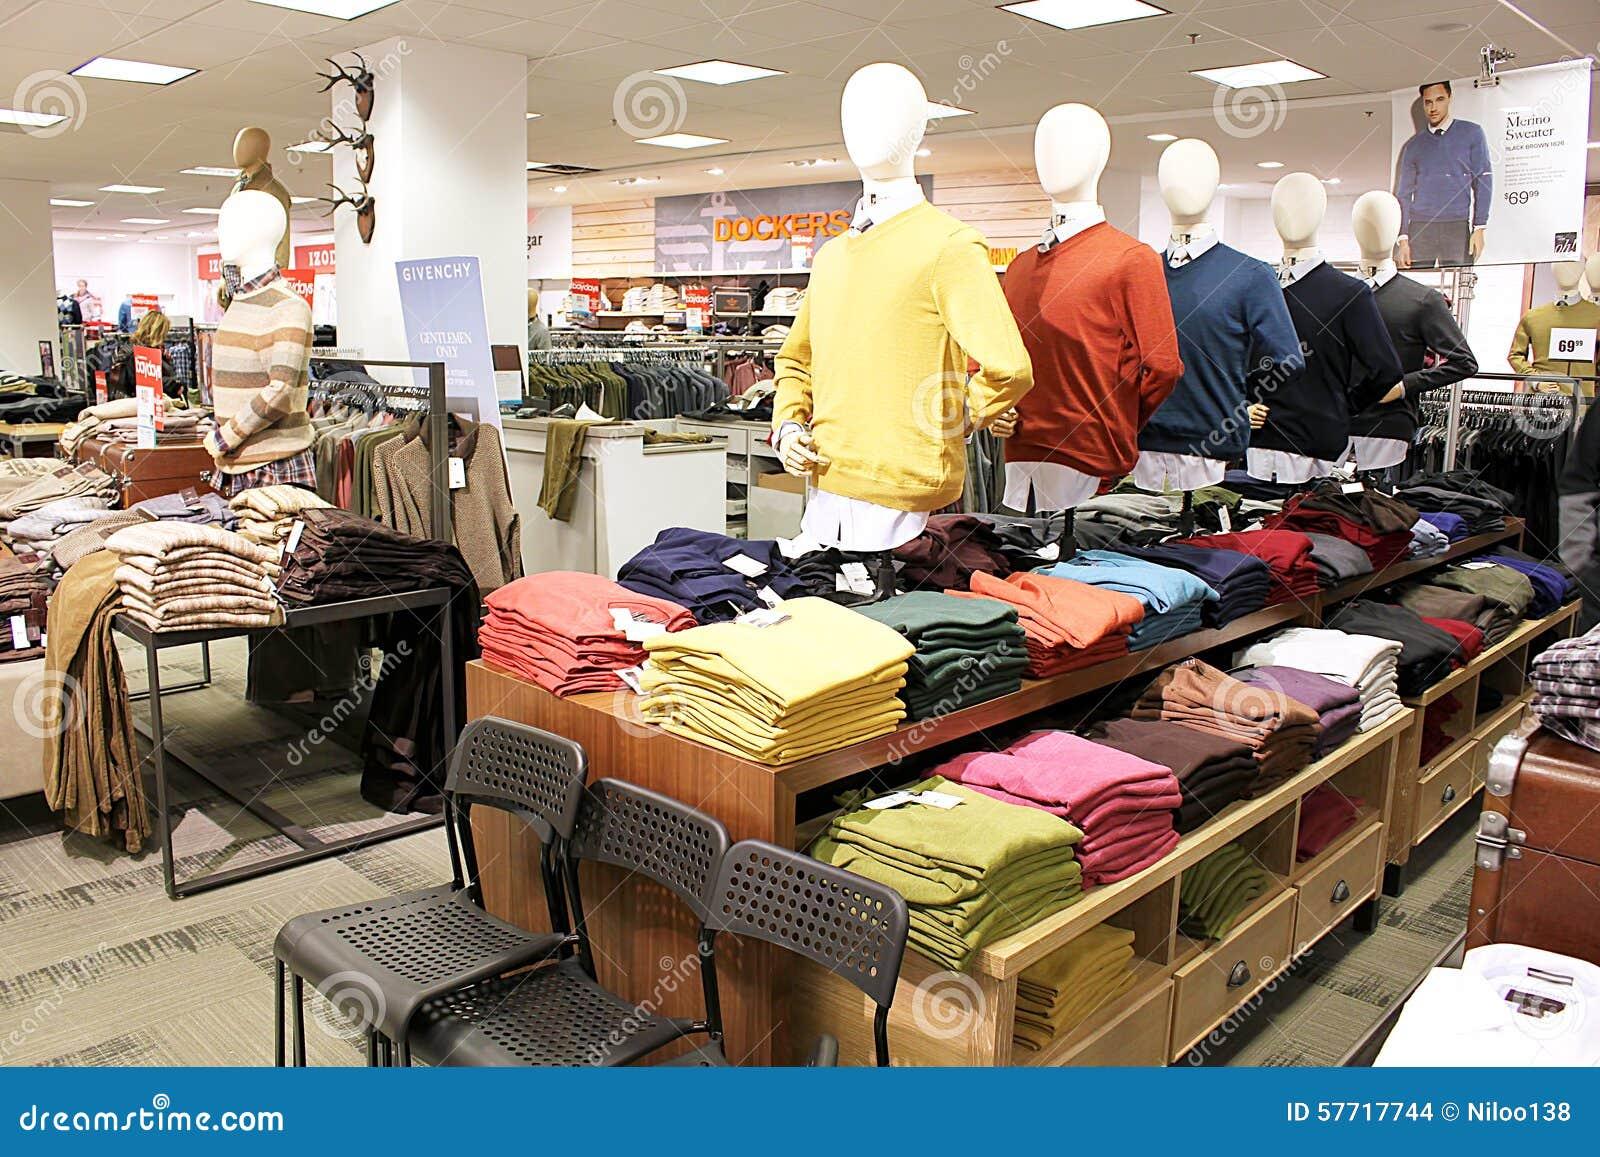 Clothes department stores